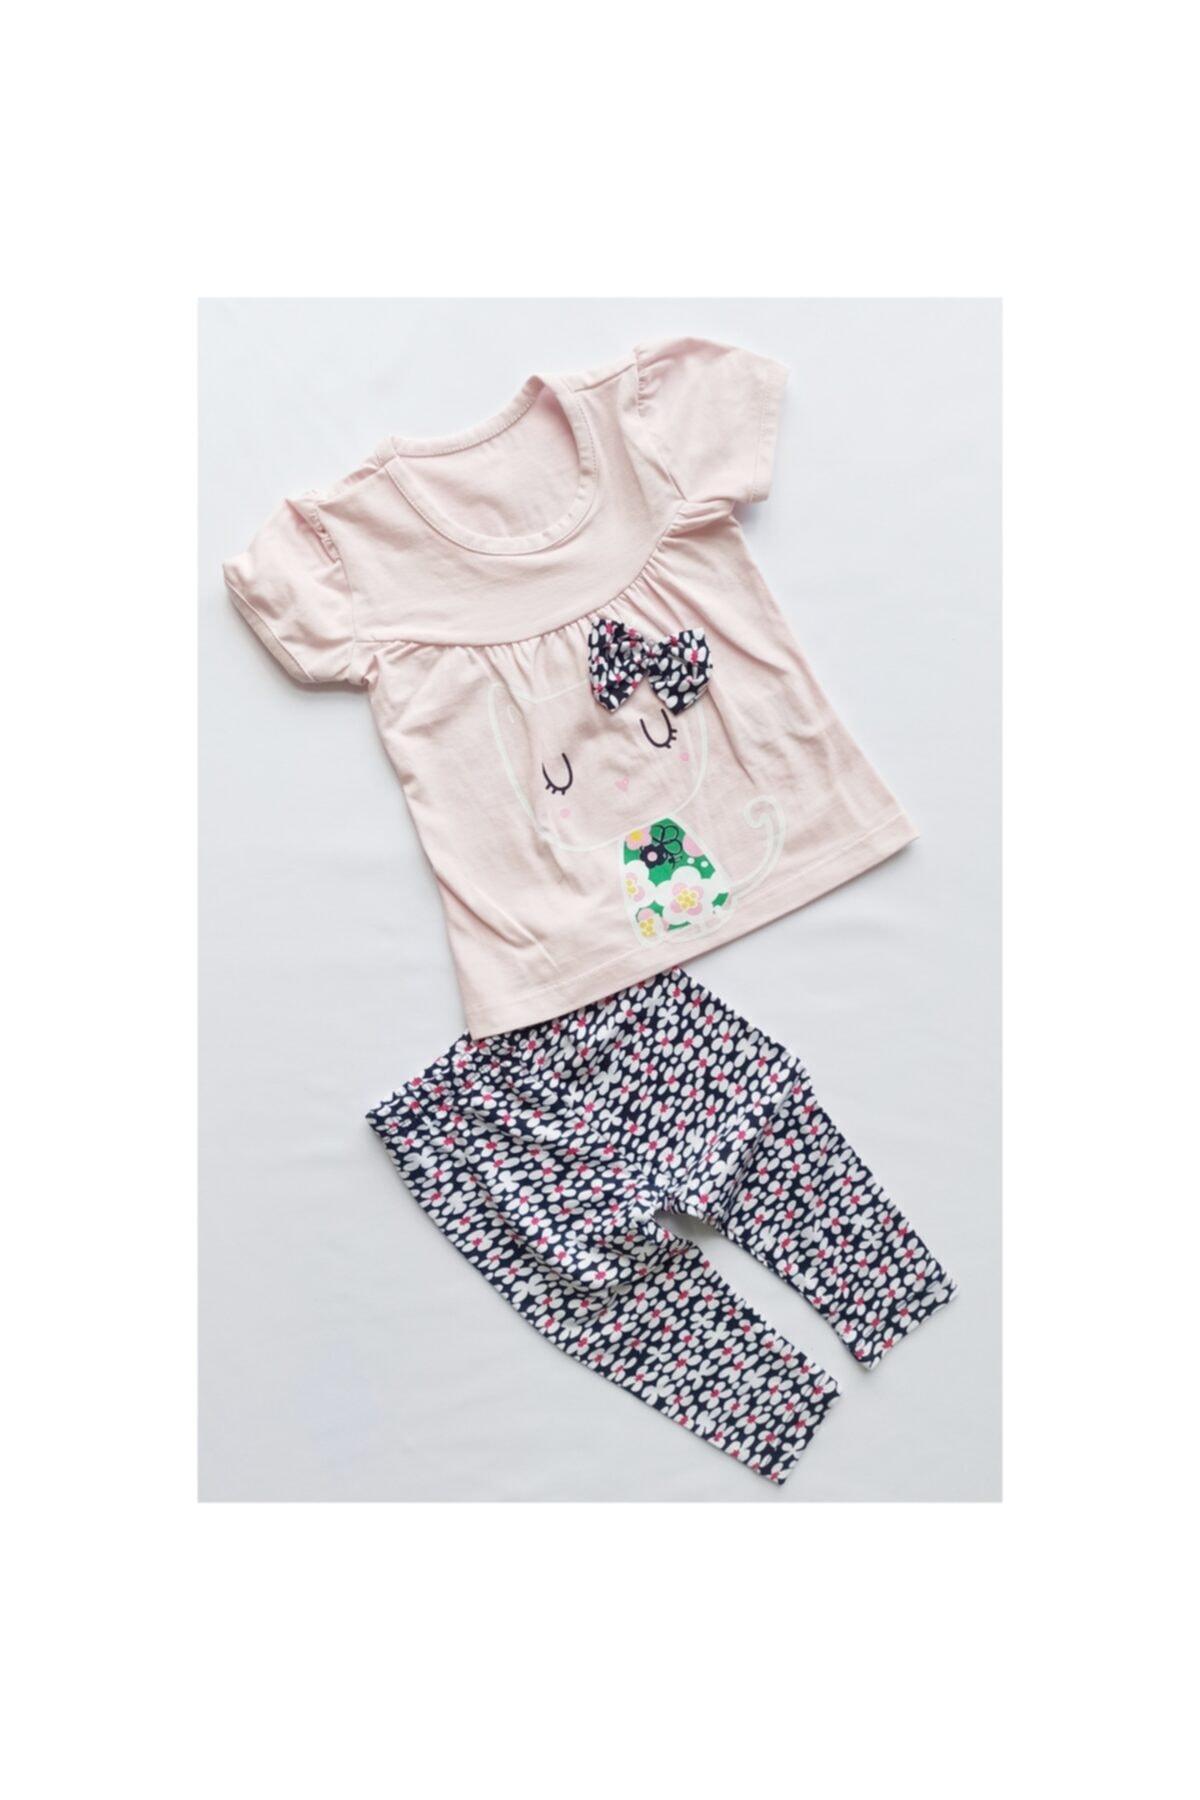 Crazy Baby Kız Bebek Tişört , Tayt Takım % 100 Pamuk 1